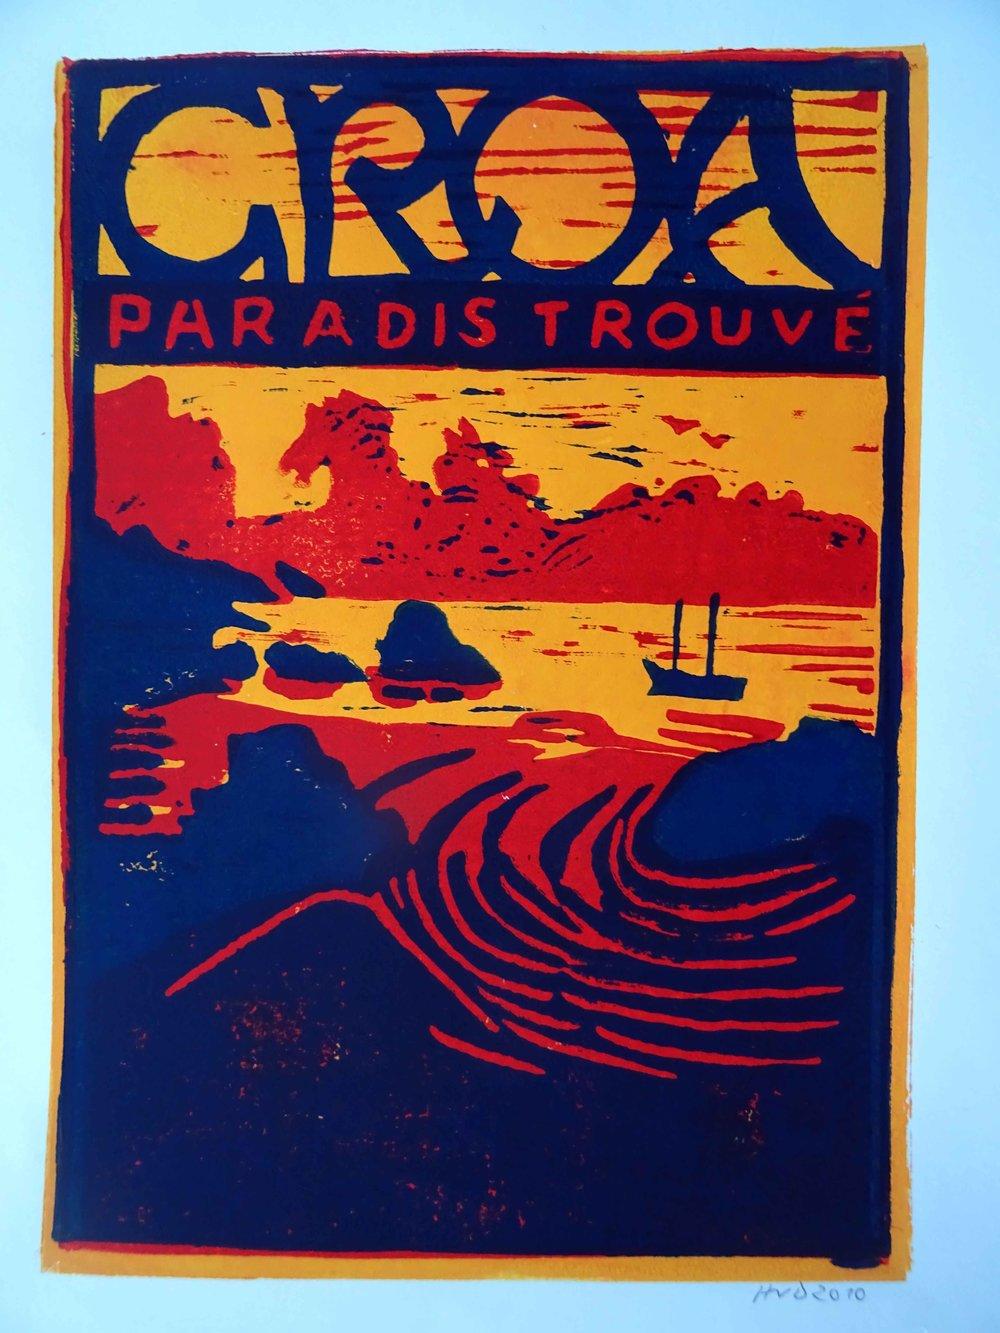 41 - Groa paradis trouvé, 3-plate lino 30x20cm, 80 €